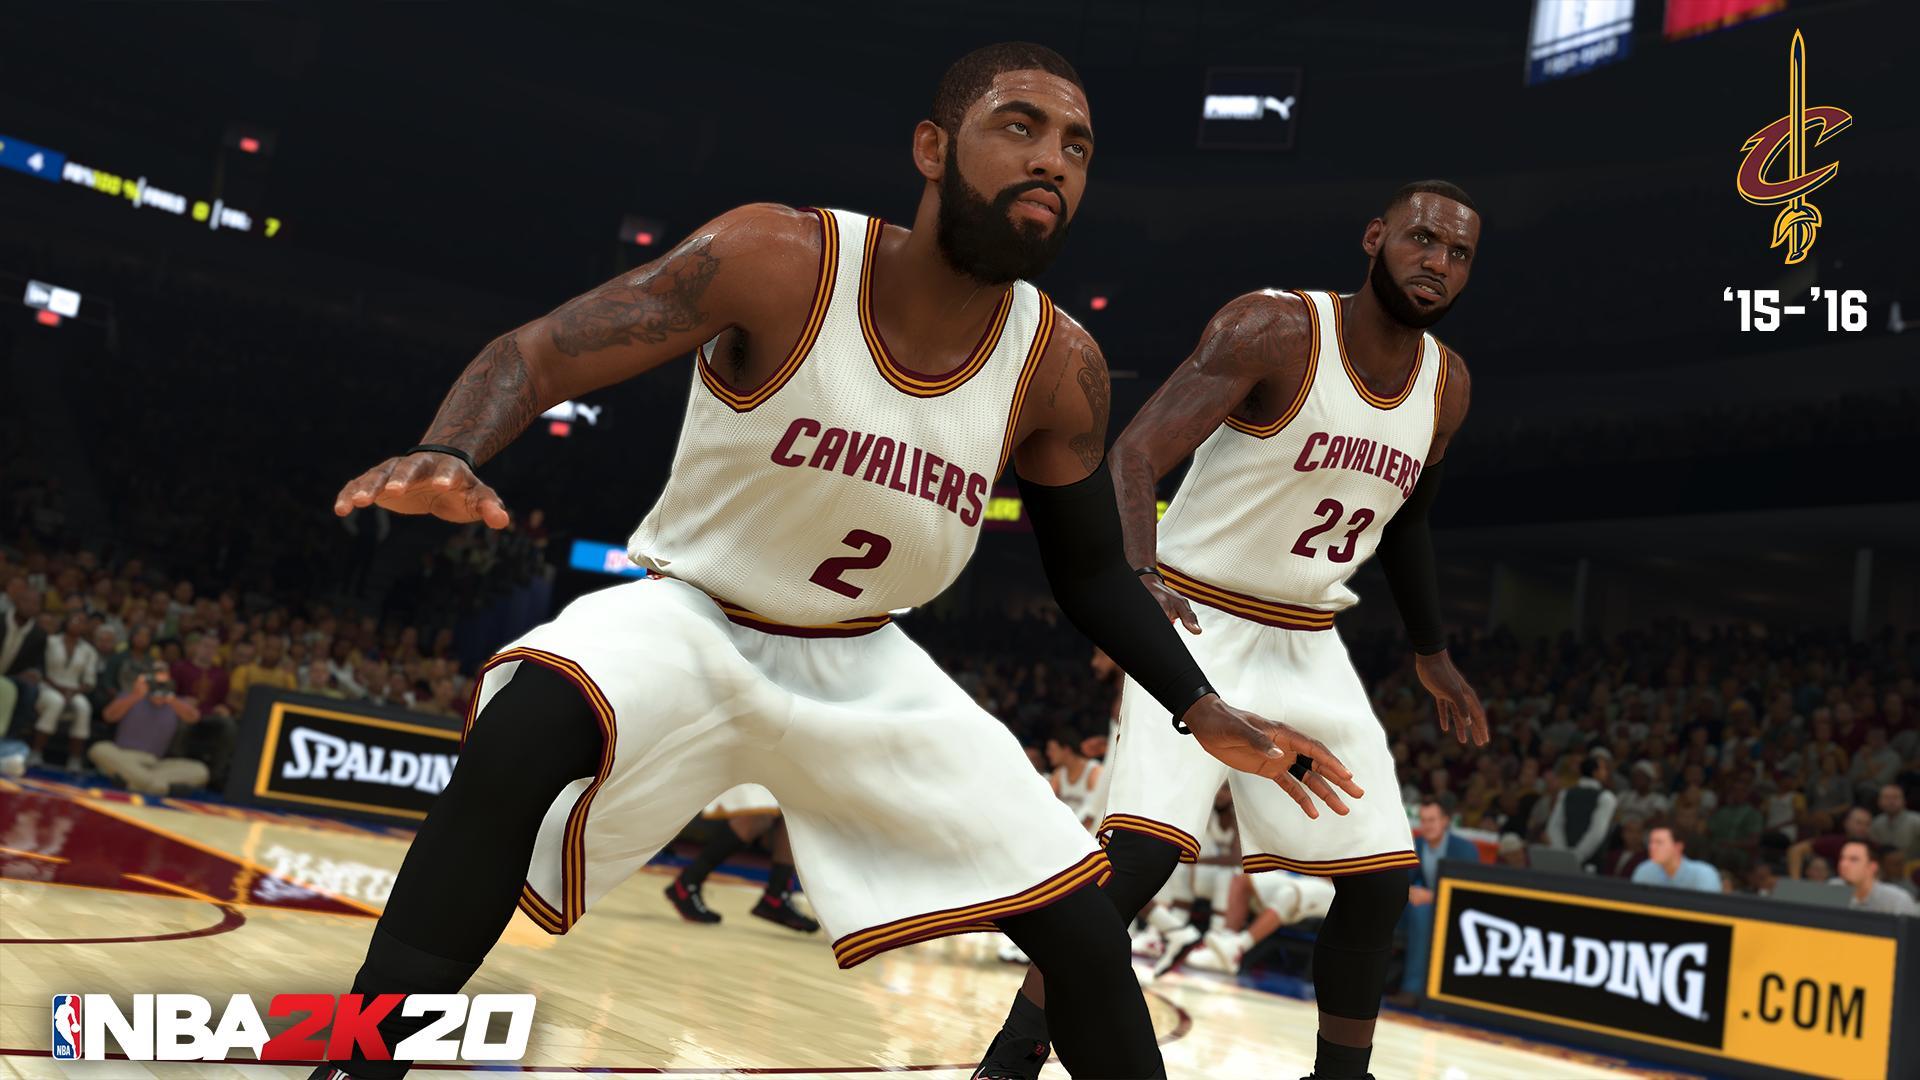 'NBA 2K20' adds six new classic teams, including 'Lob City' Clippers, champion Cavs